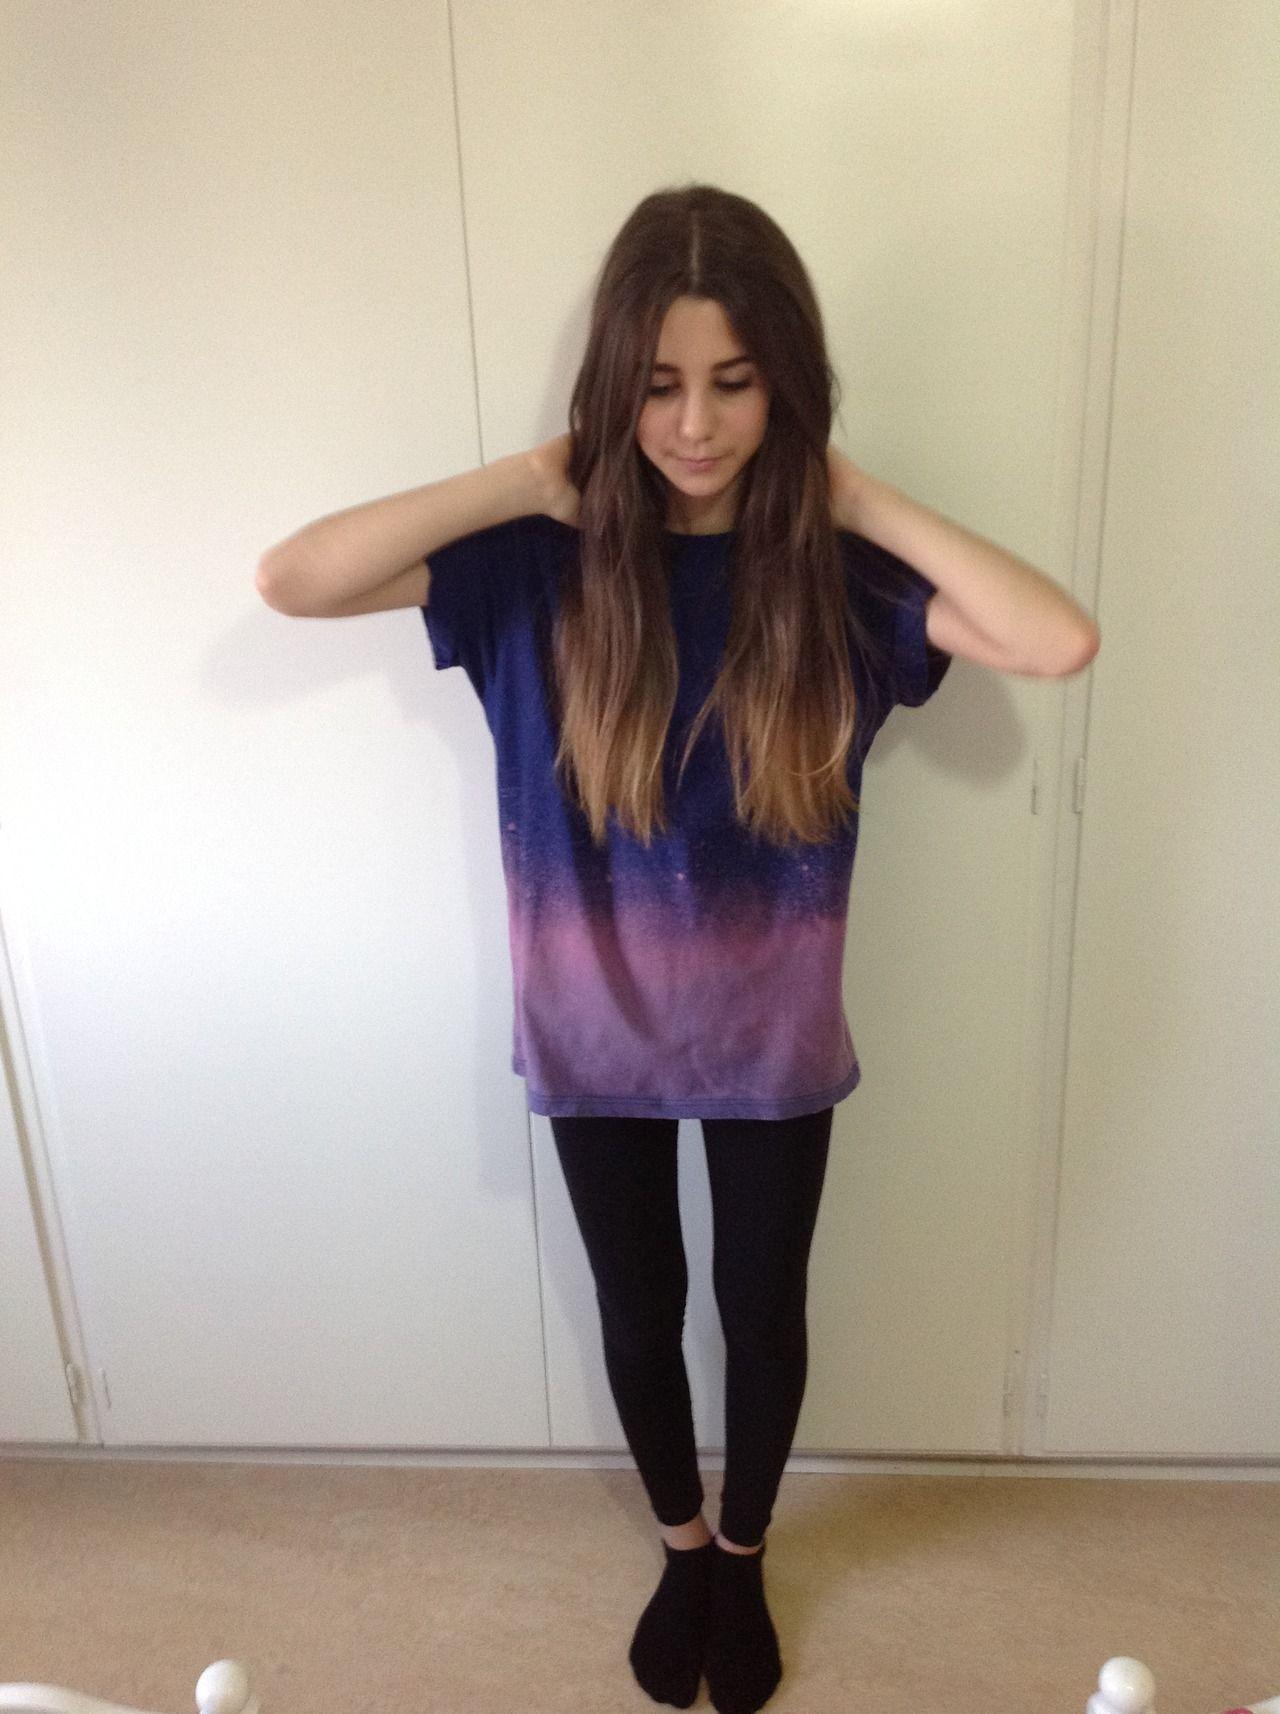 Hot teen girl dark hair